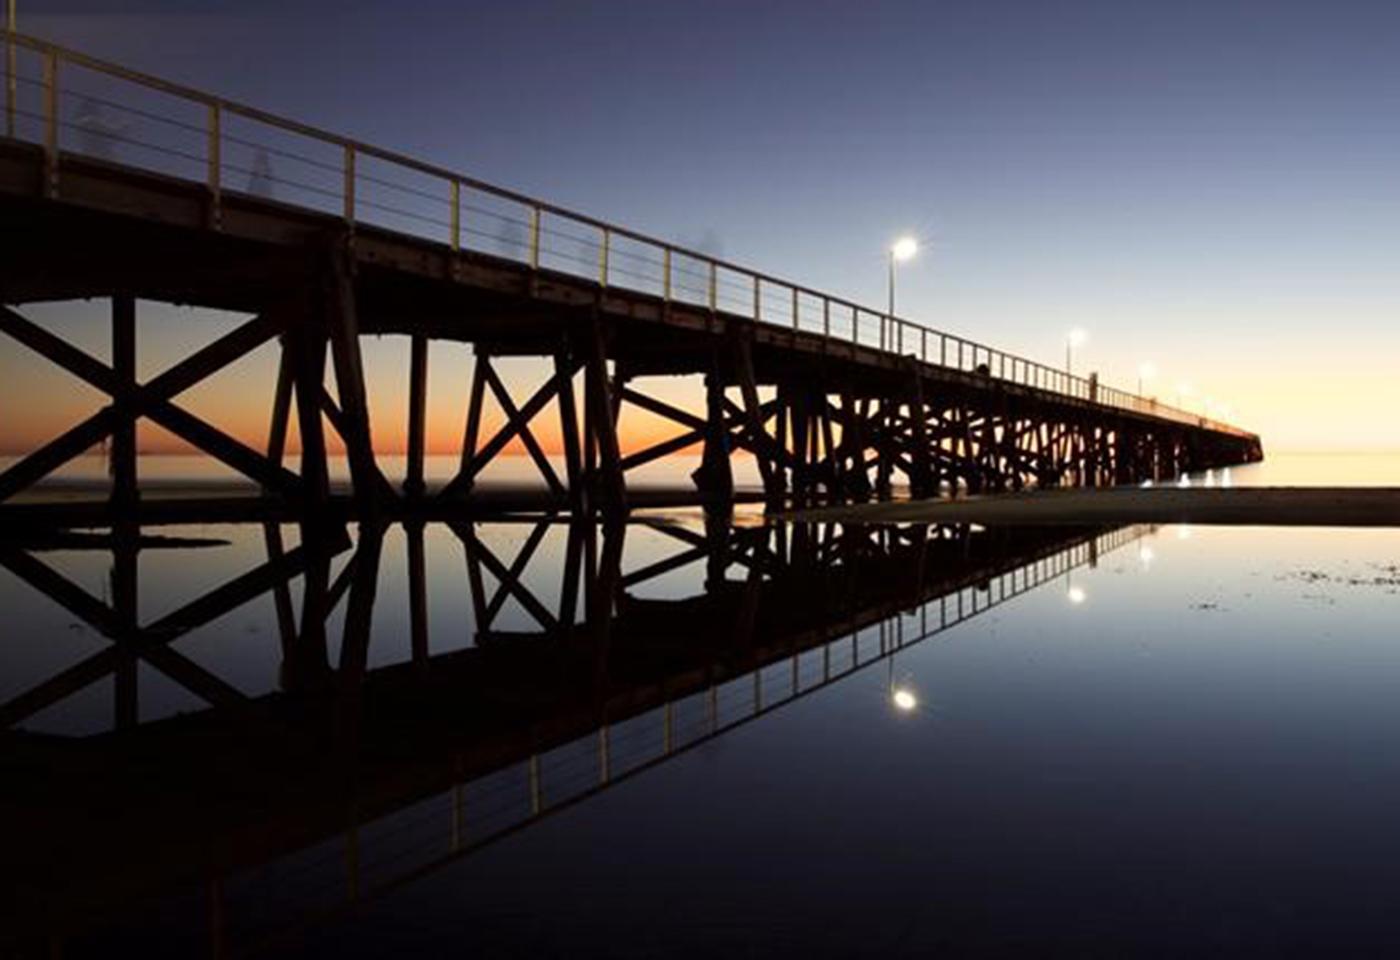 long exposure Sunset image Applecross Jetty